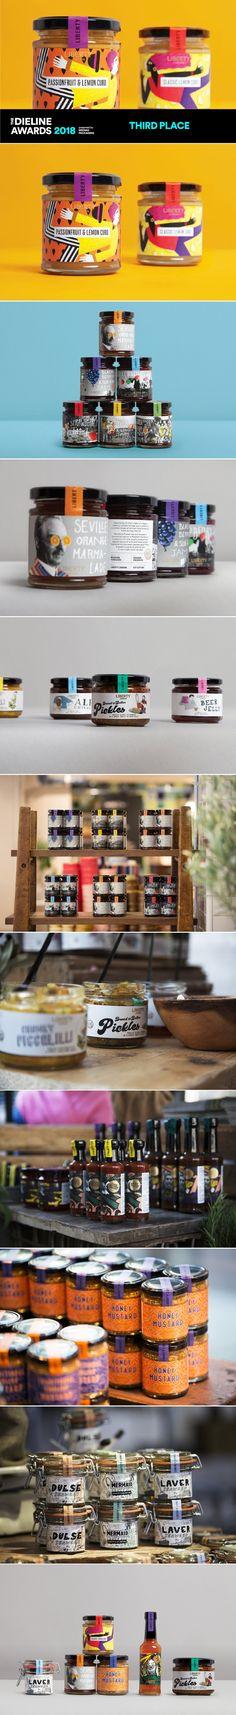 The Dieline Awards 2018: Liberty London — The Dieline | Packaging & Branding Design & Innovation News